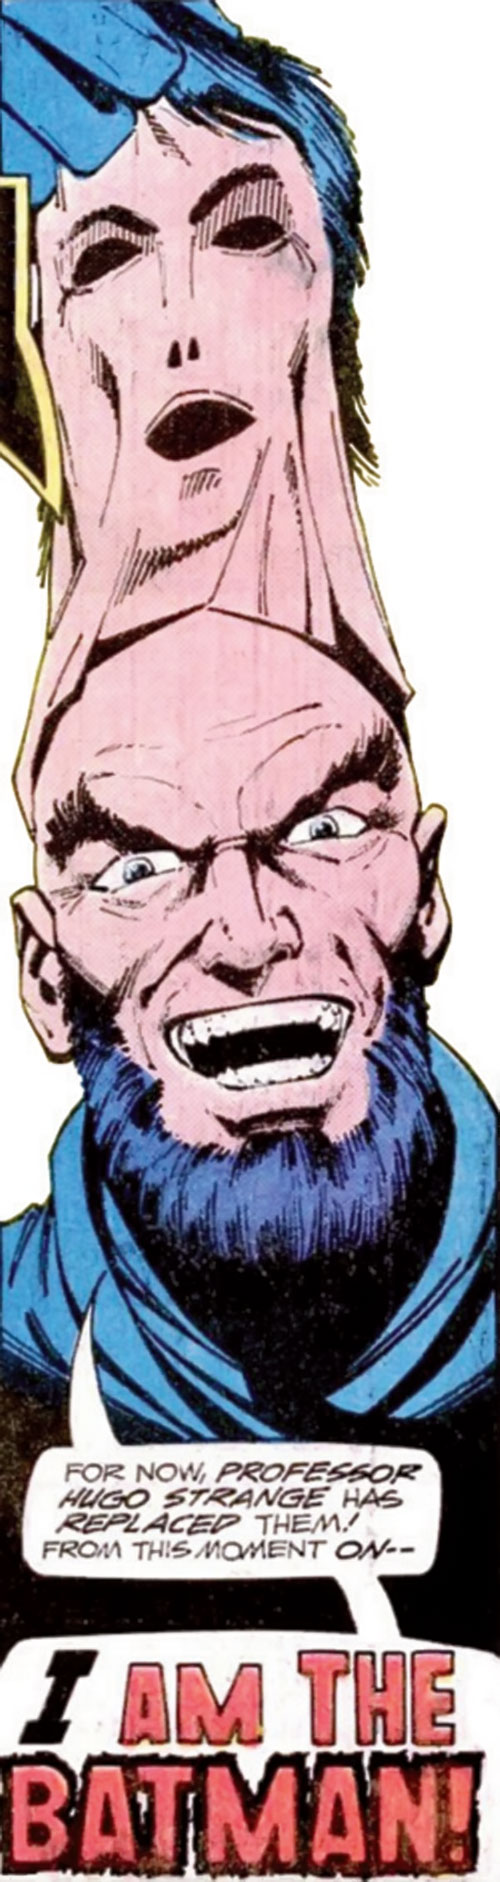 Hugo Strange (Batman enemy) (DC Comics) triumphantly removing his mask